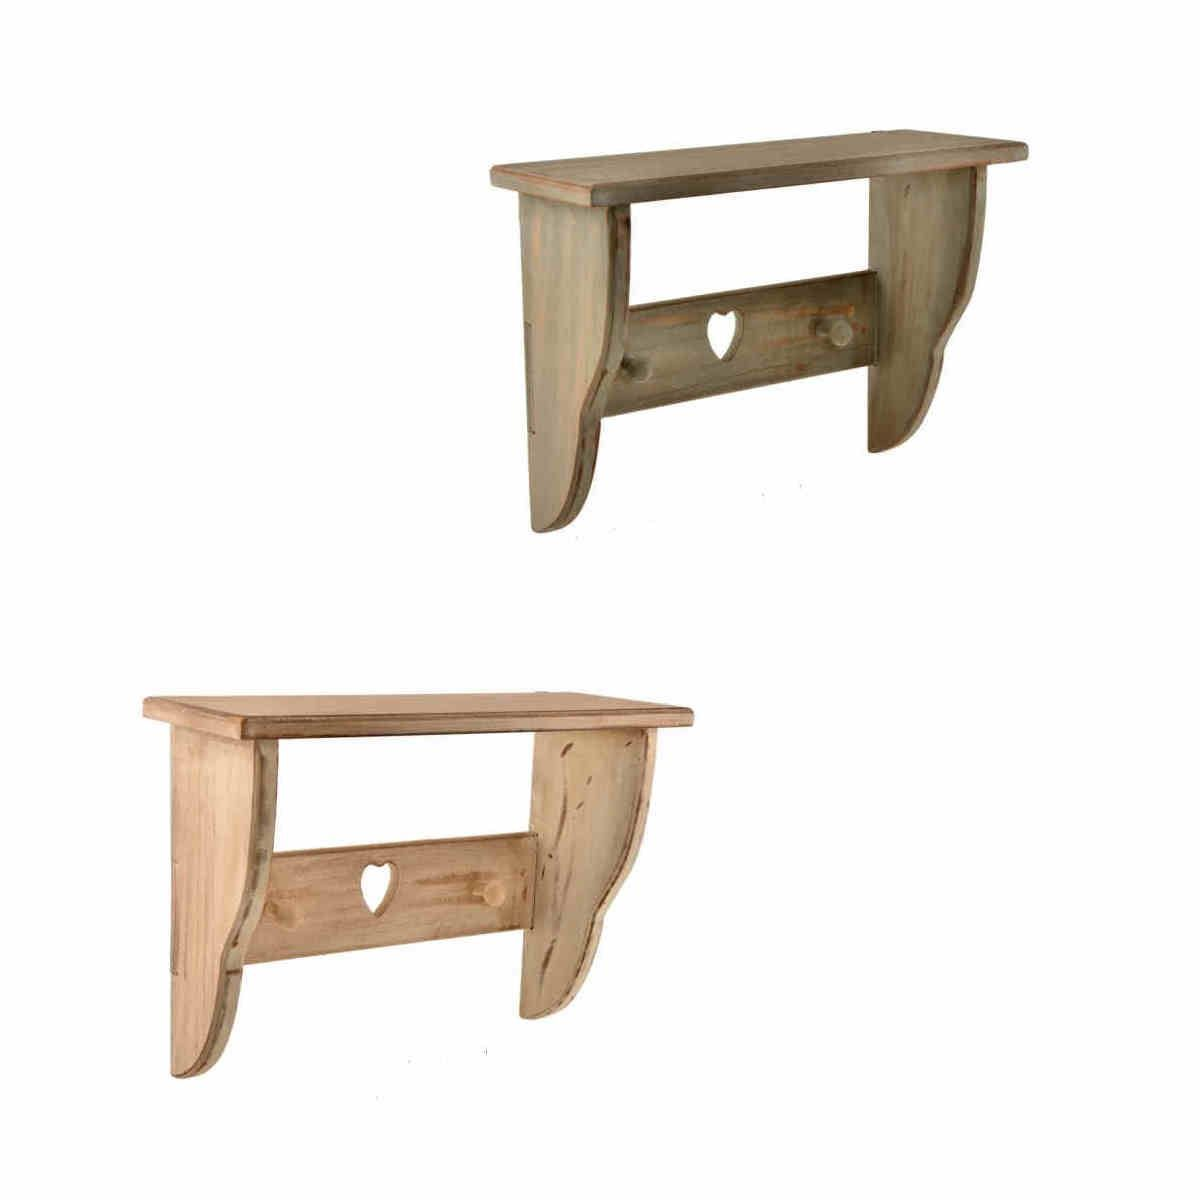 wood wall shelving units